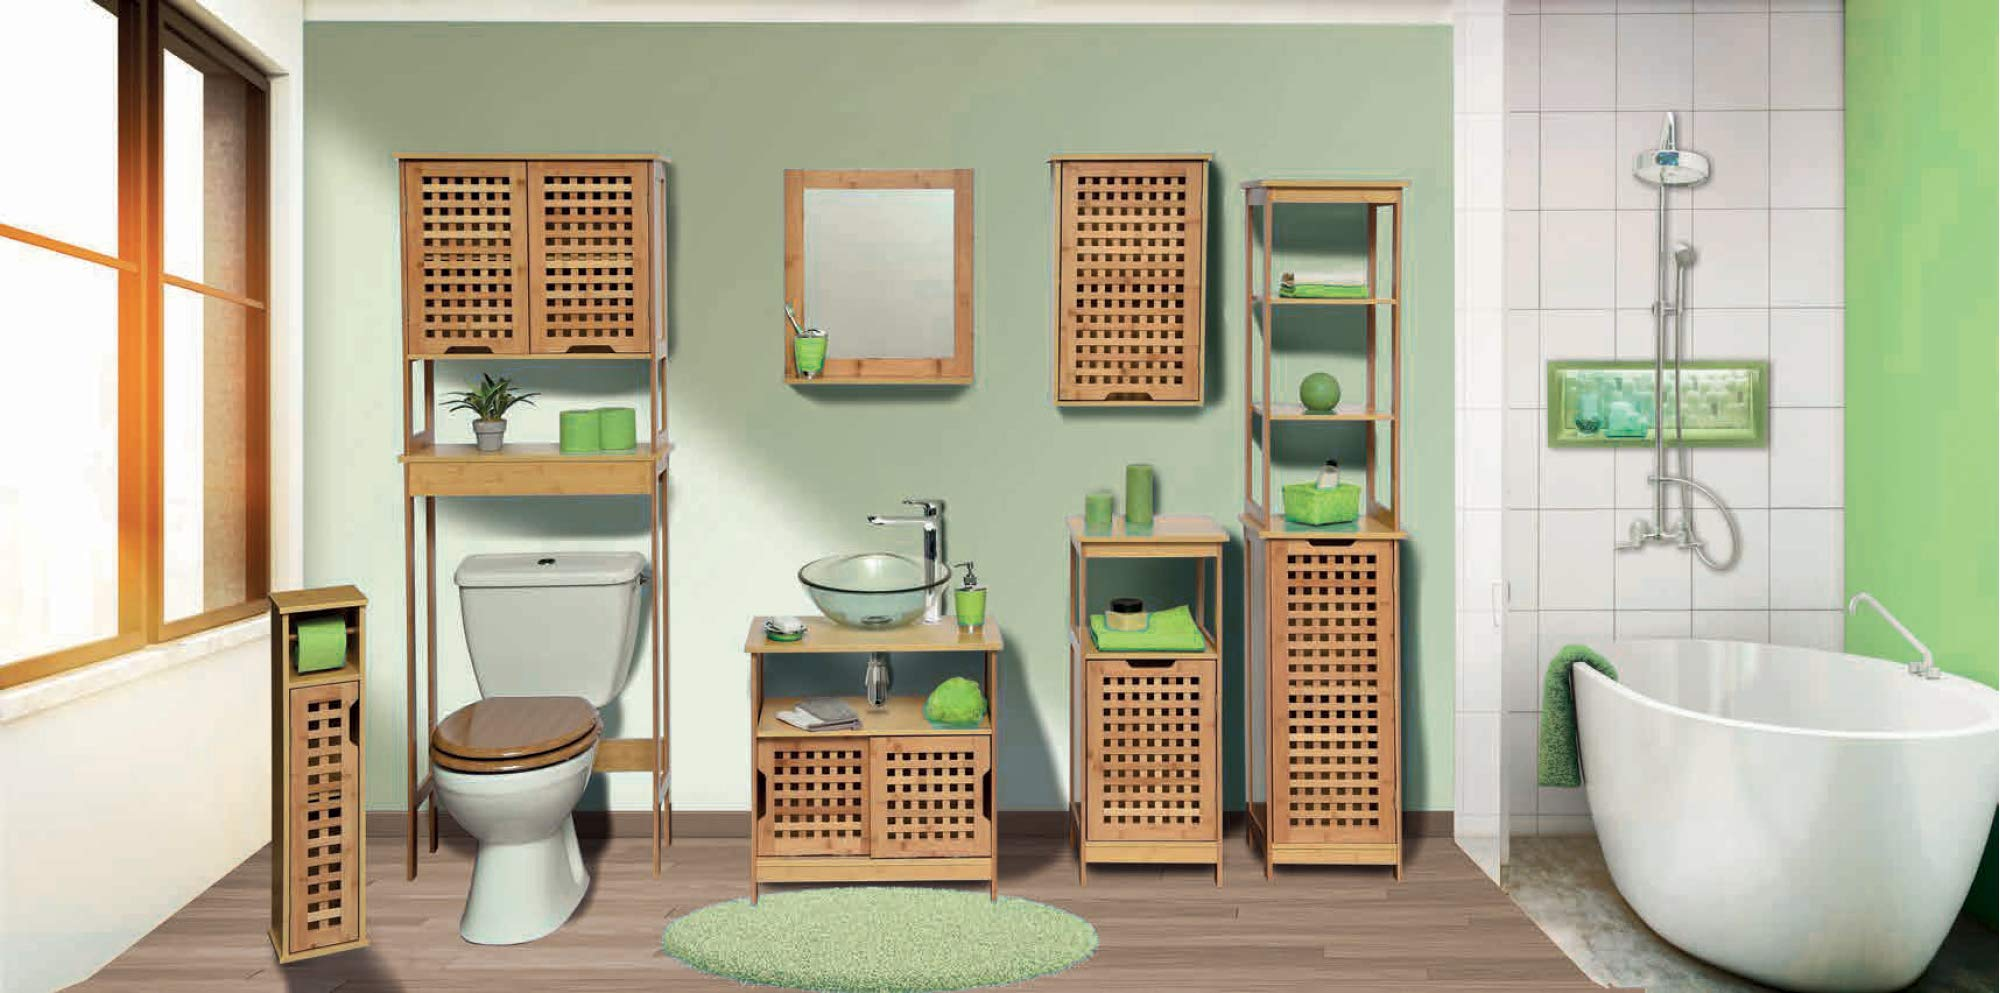 TENDANCE Mueble Baño Columna KOH Lanta con 1 Estantería y 1 Puerta– Armario Baño Bambú 36,5 x 83 x 30 cm